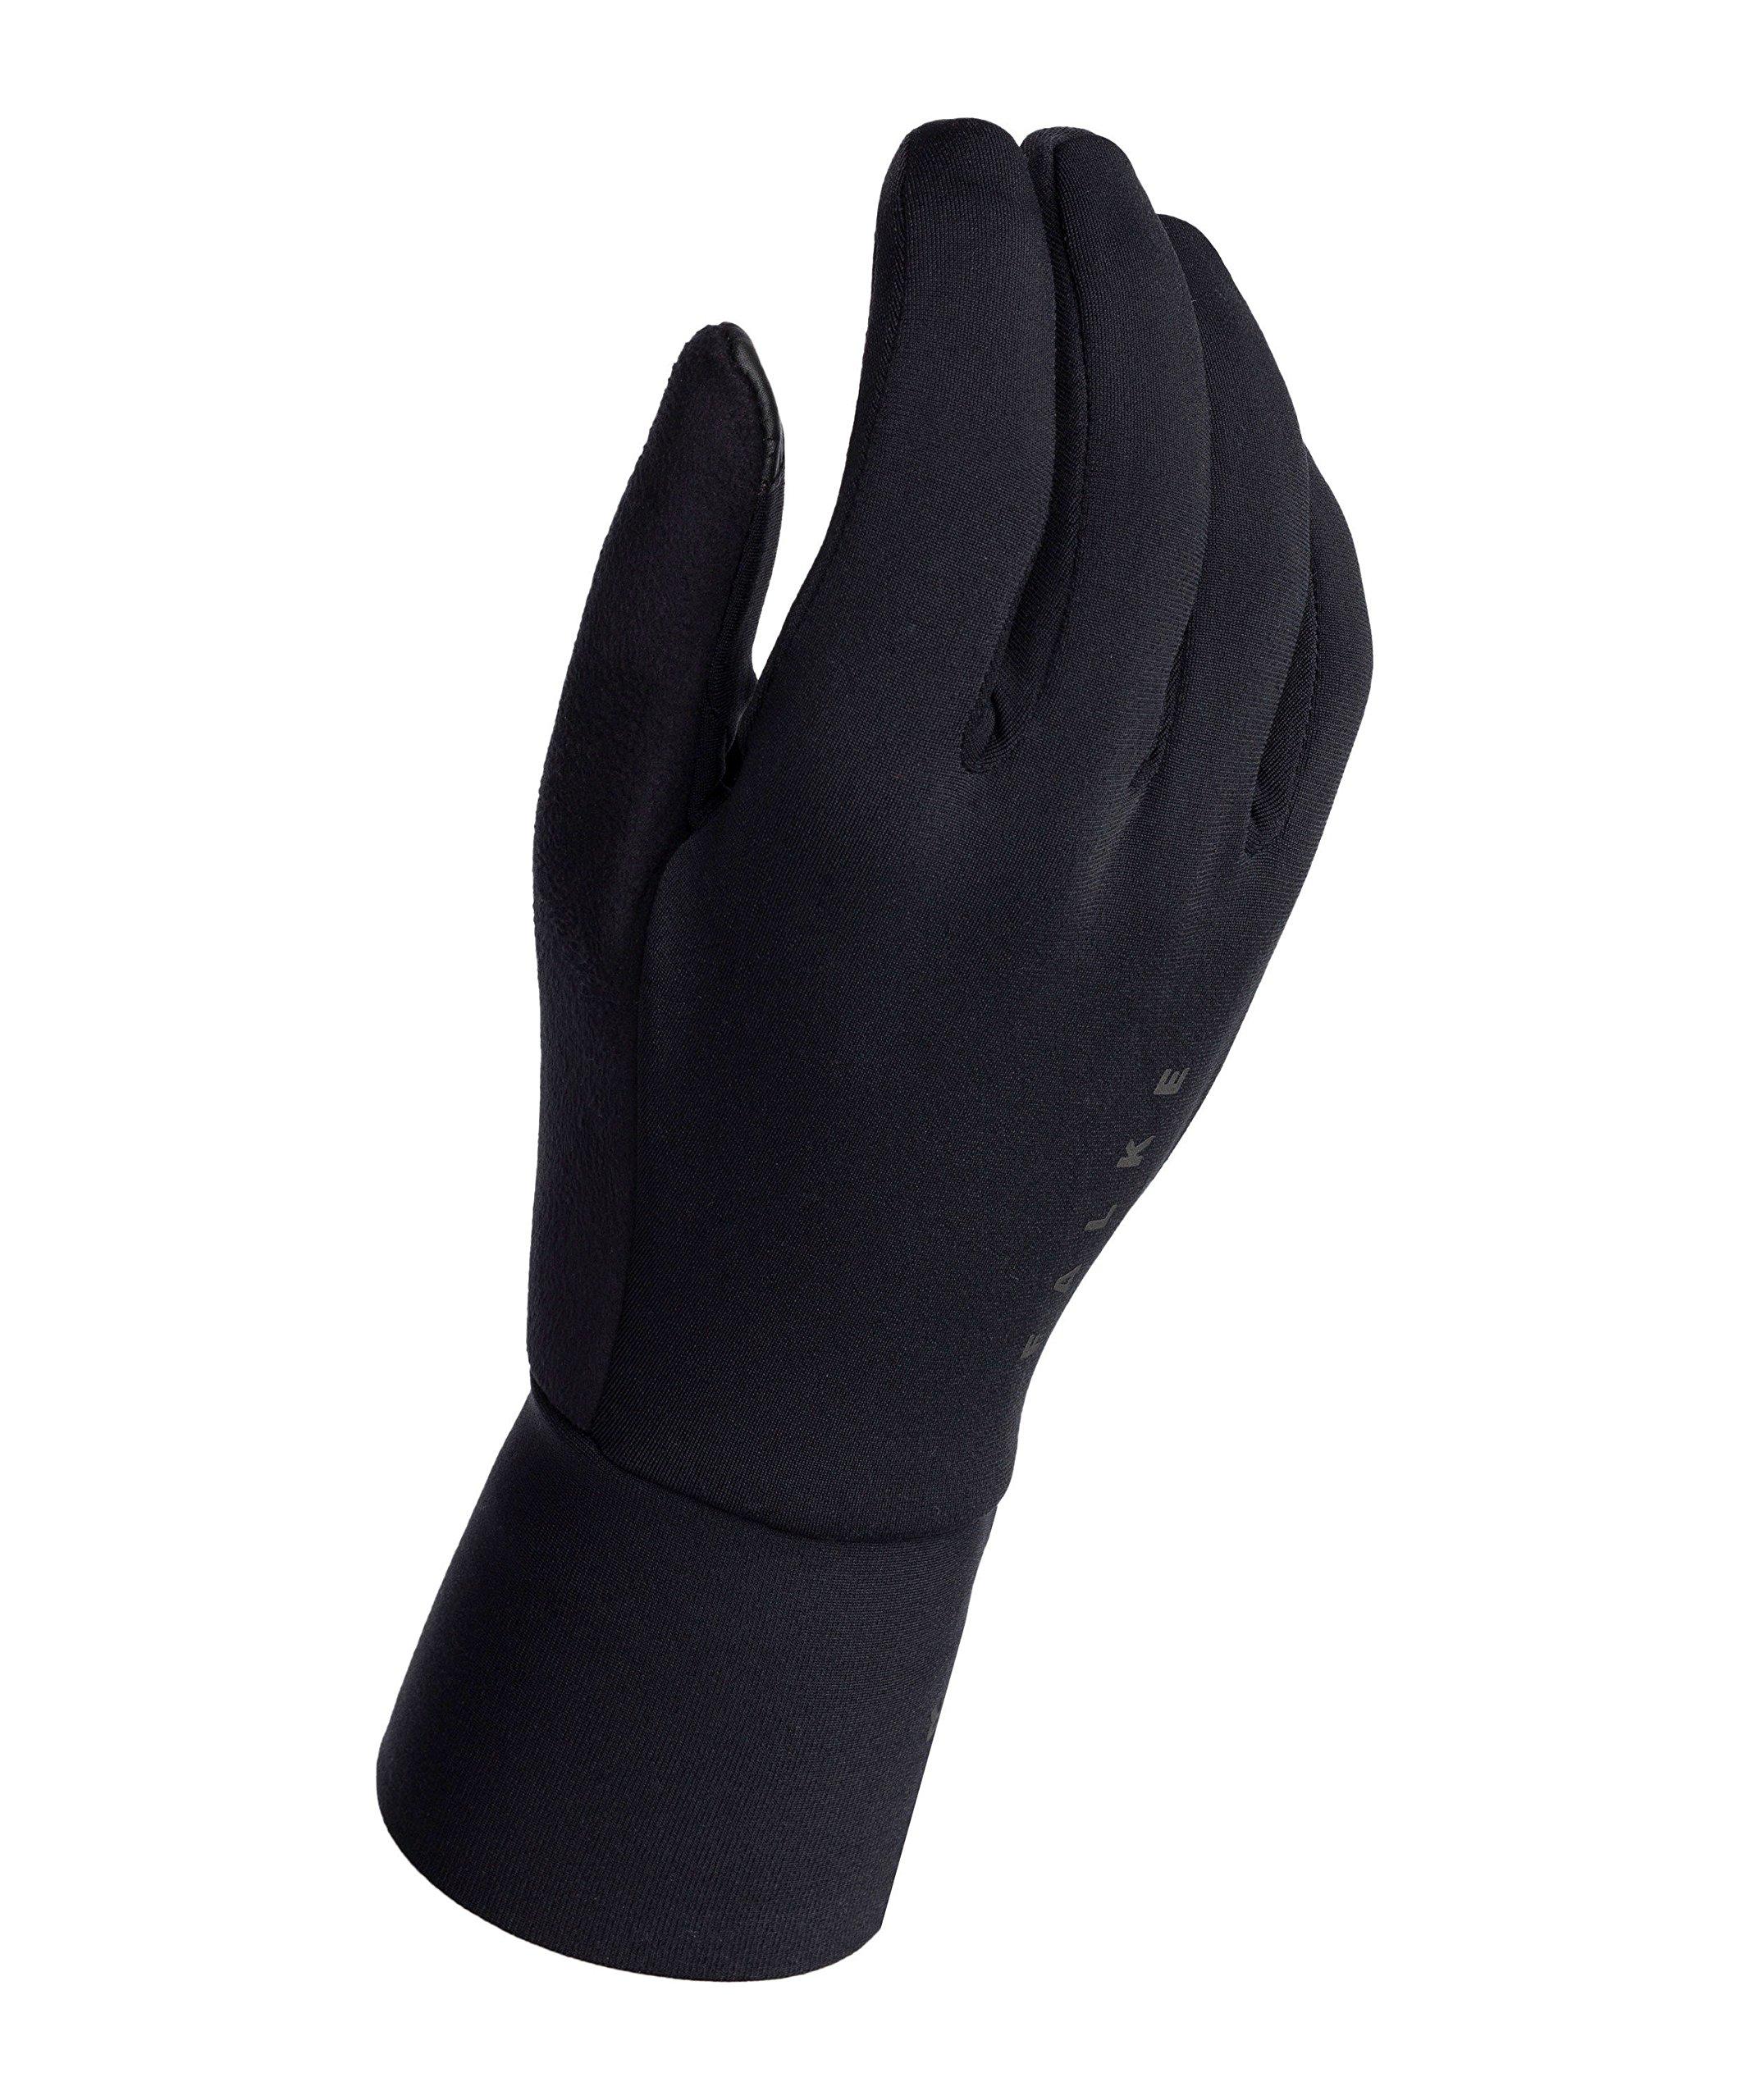 FALKE Herren Gloves Brushed Unisex Accessoires Black M-L